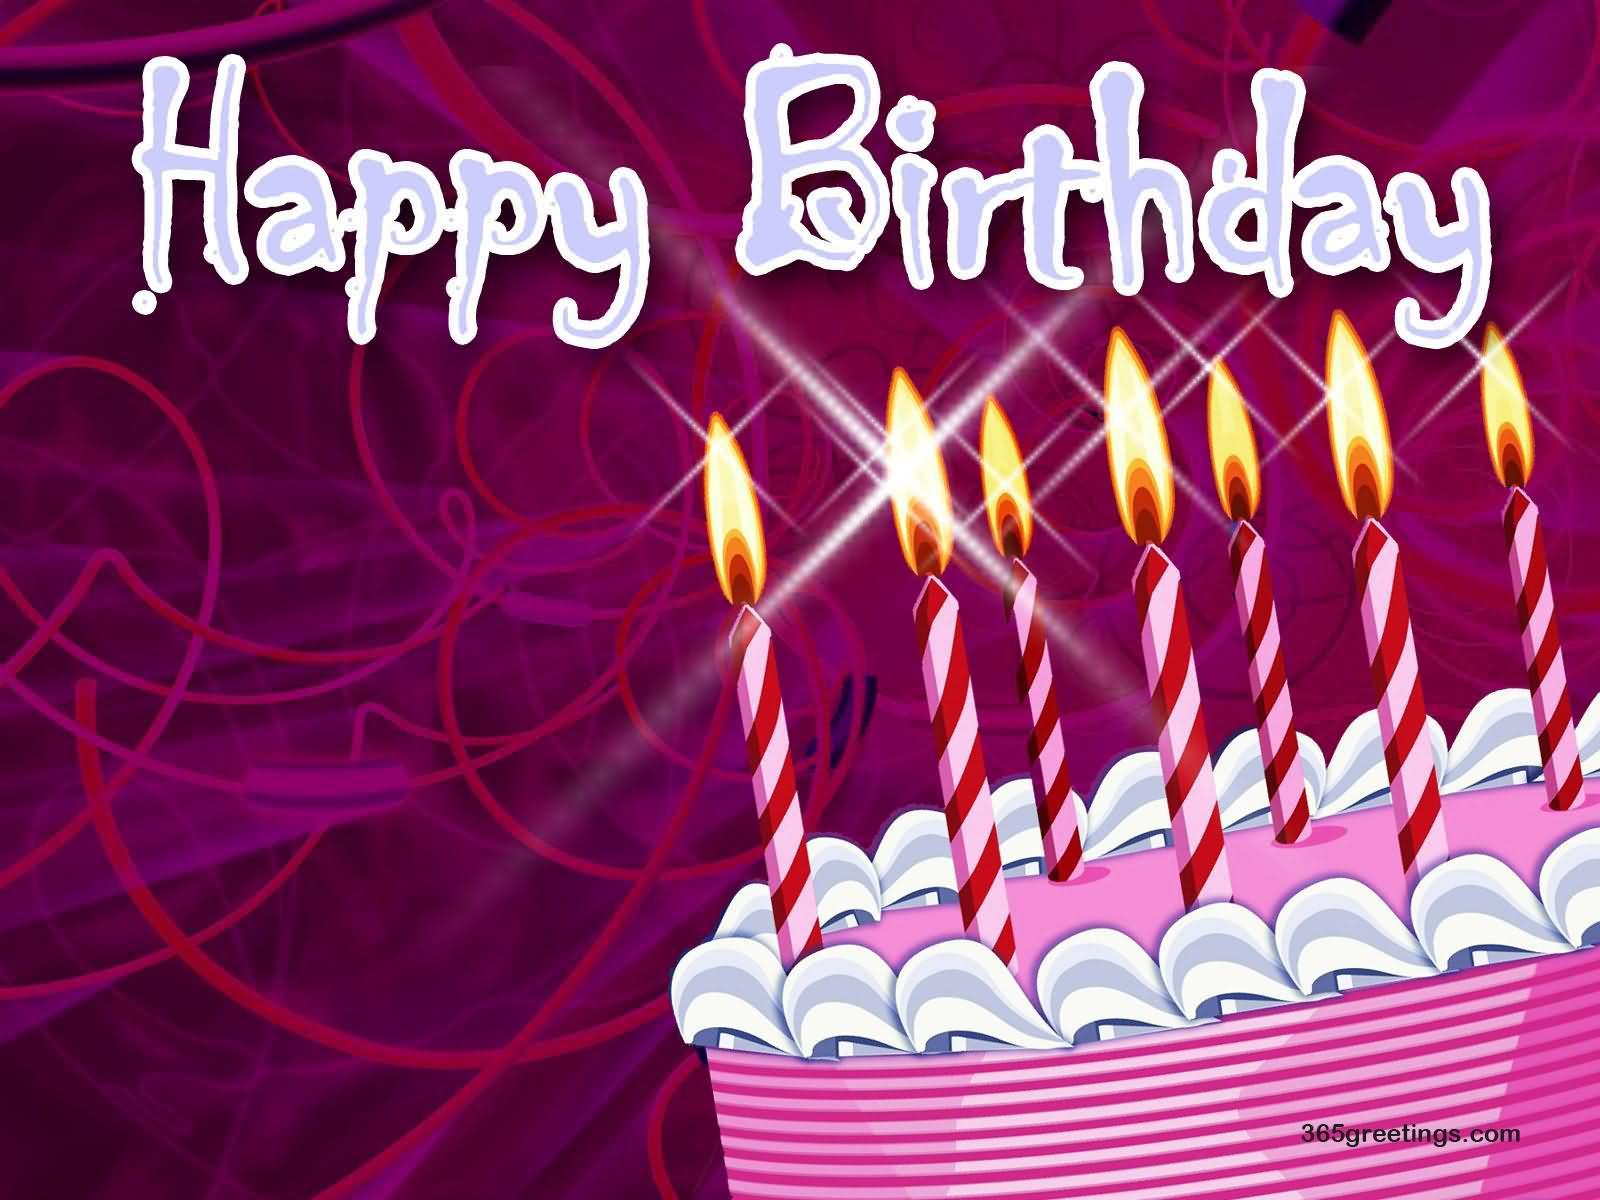 Happy Birthday Full Hd Wallpaper Graphic 1600x1200